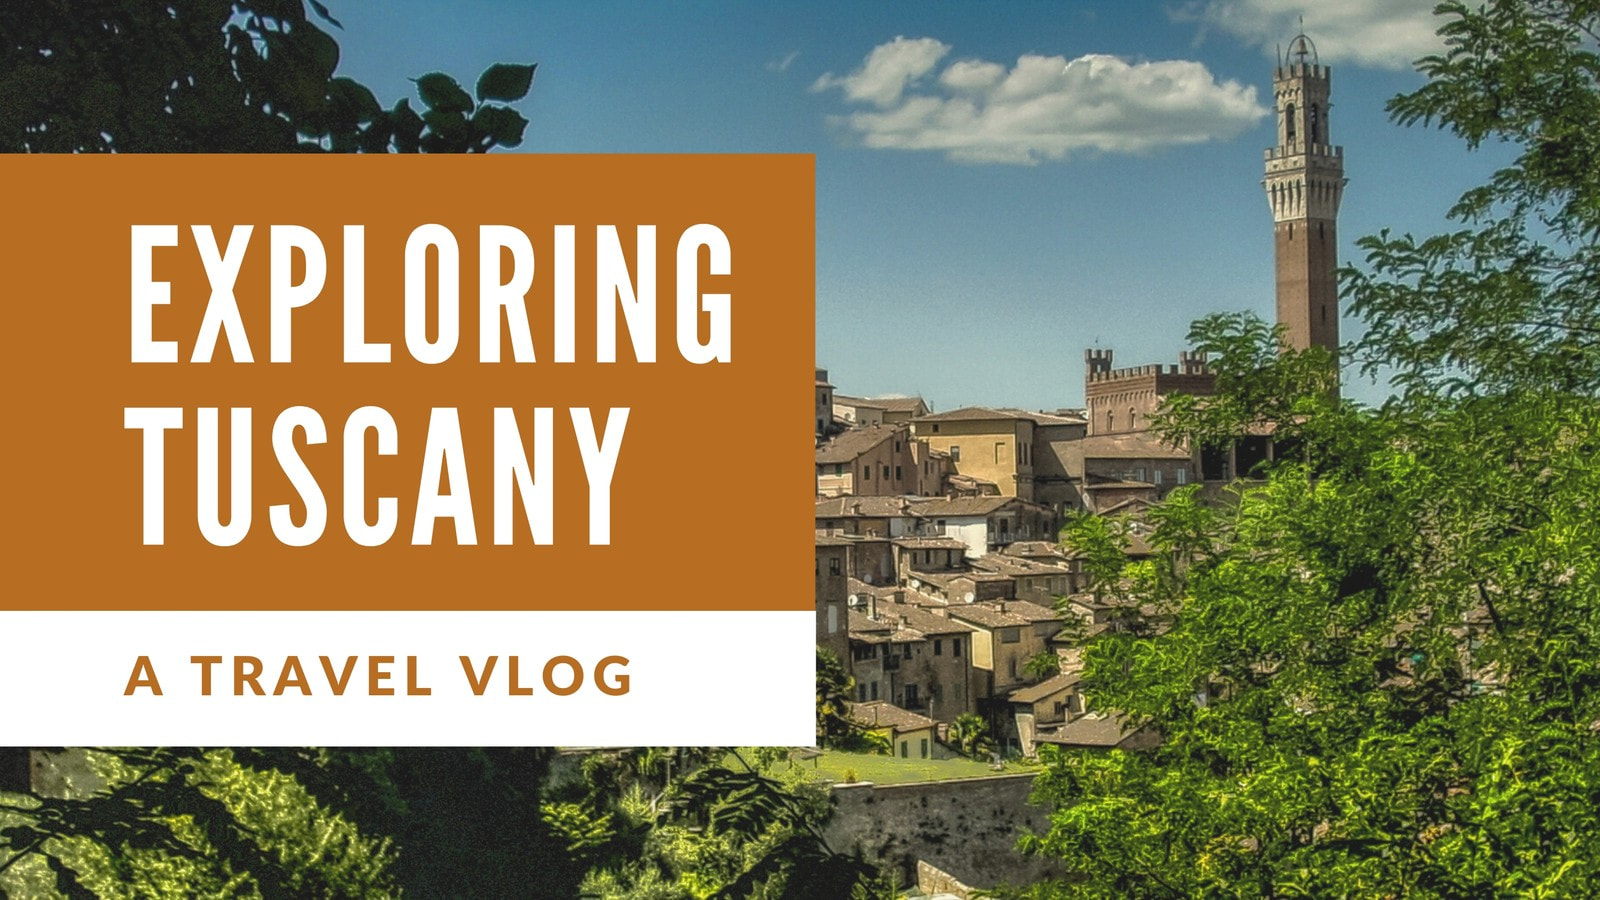 Travel Vlog YouTube Thumbnail